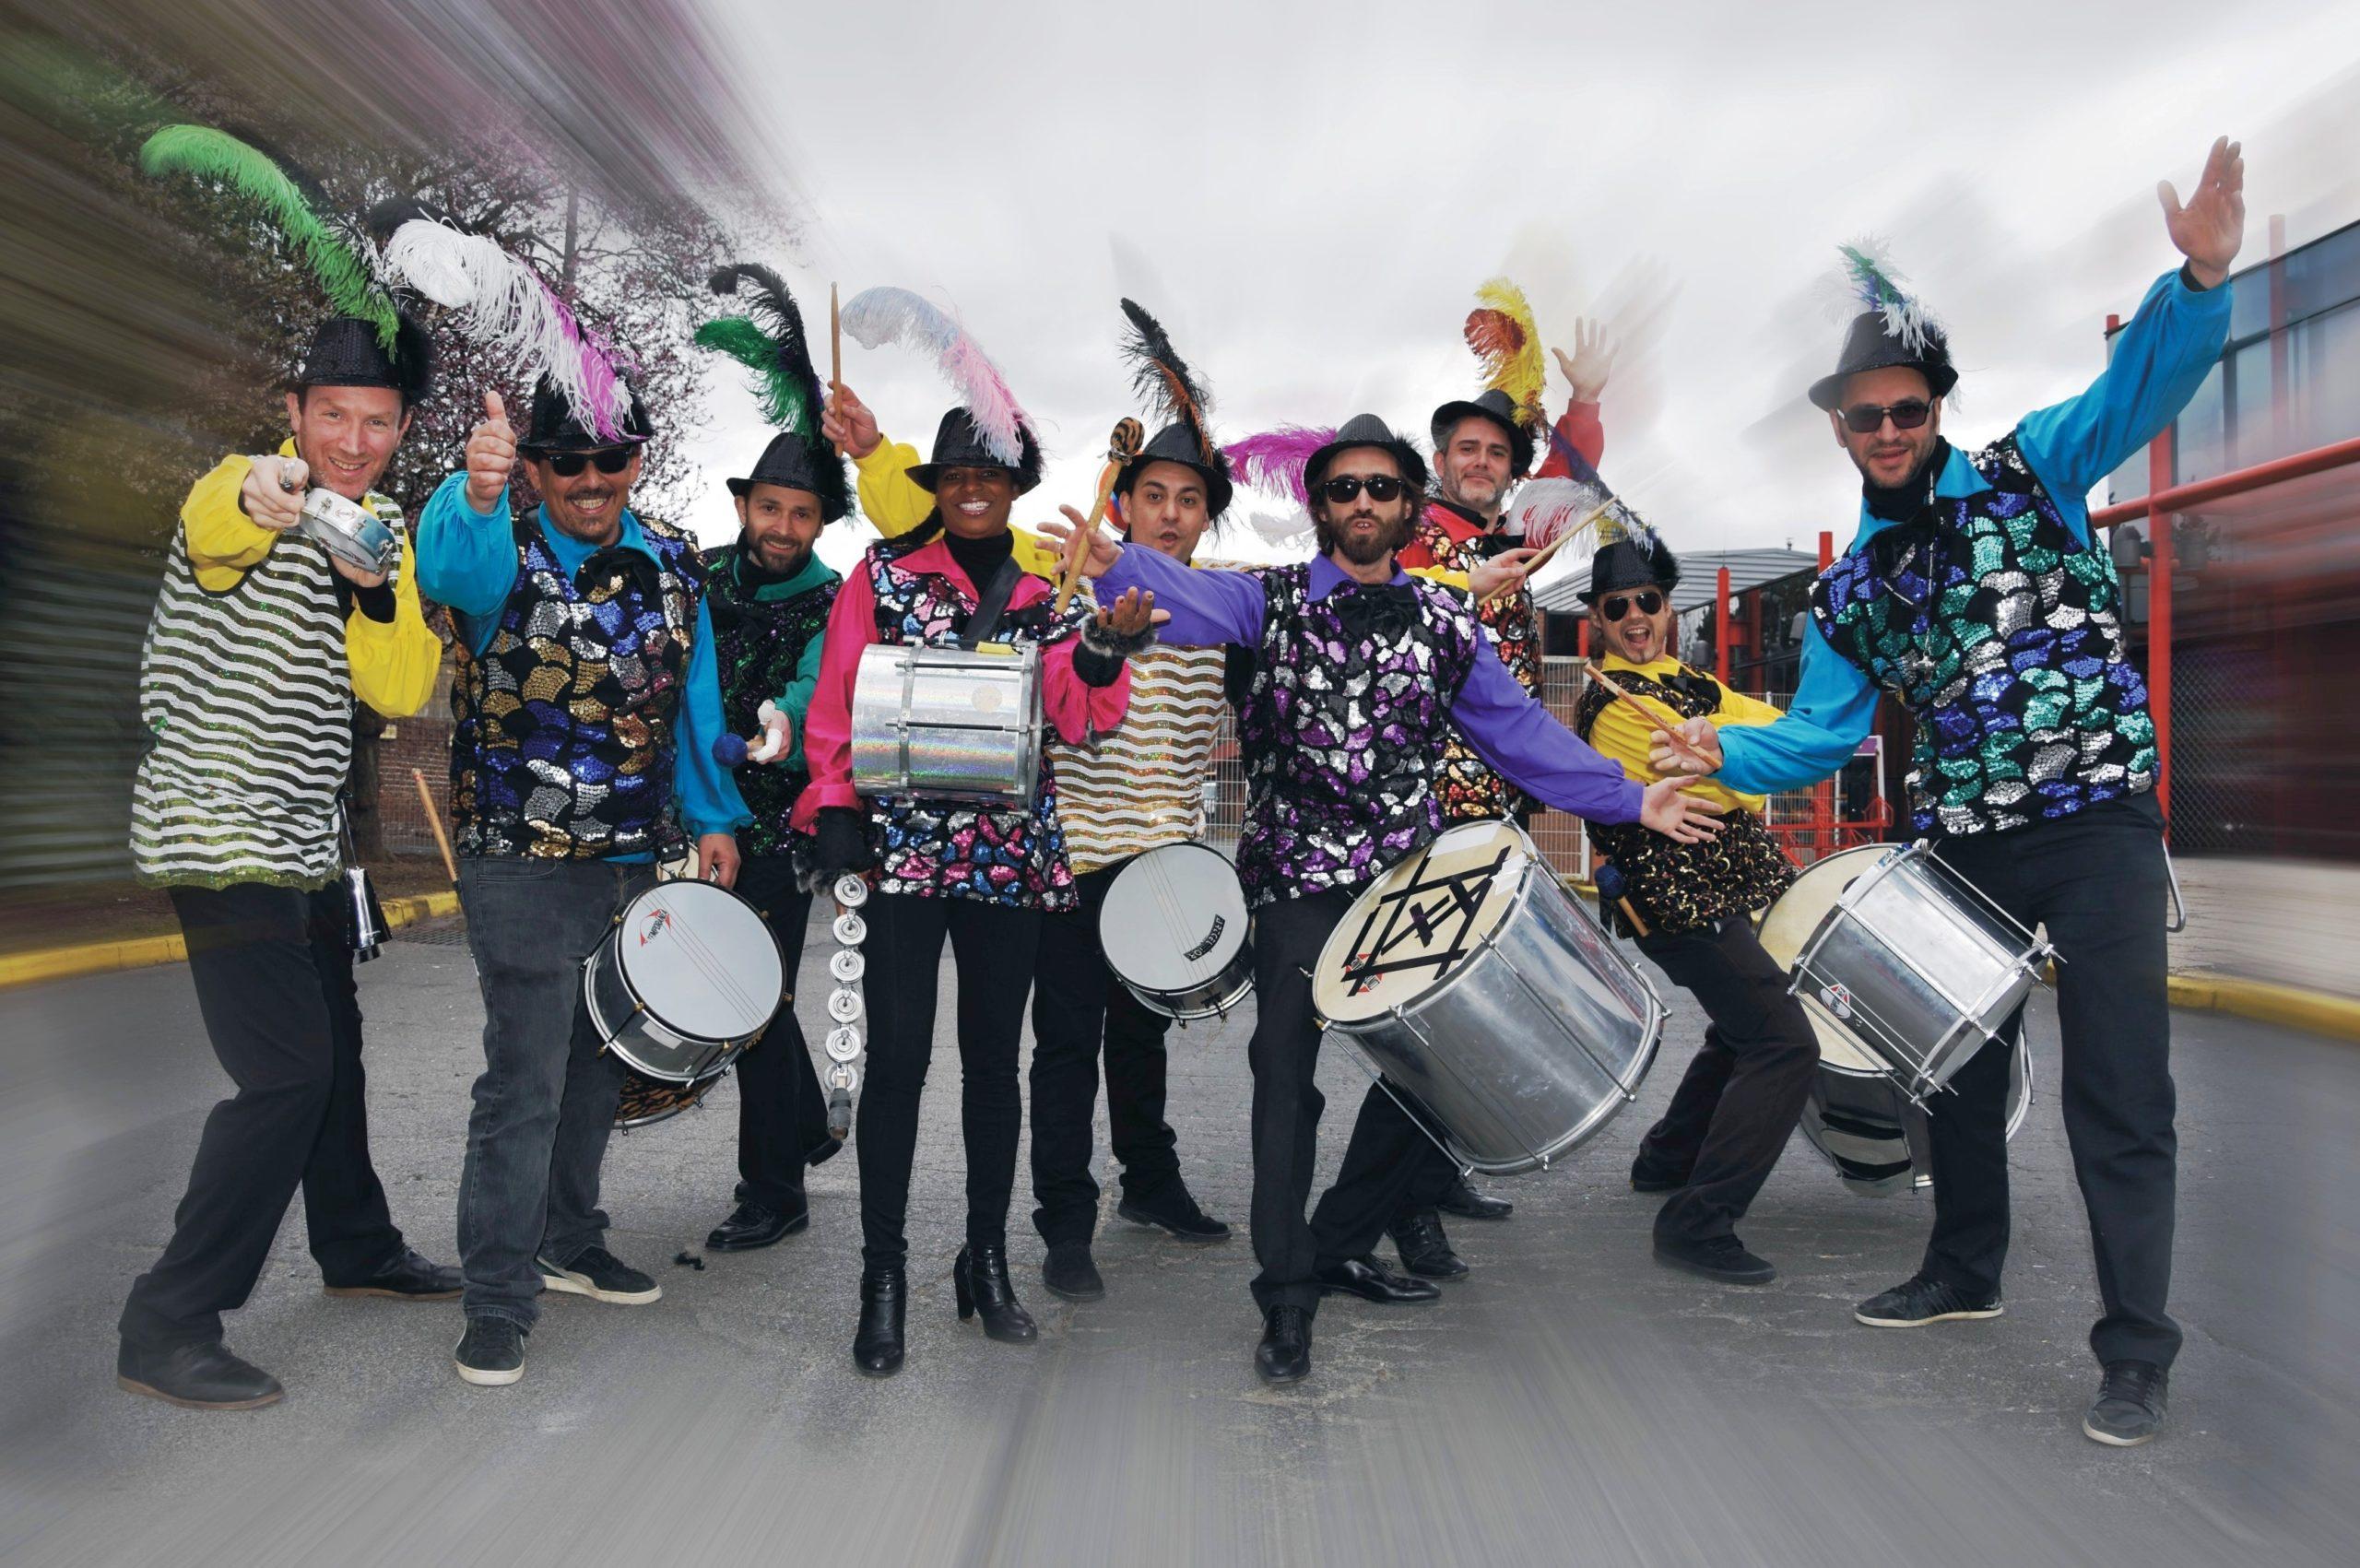 musiciens percussionnistes batucada pour grand carnaval